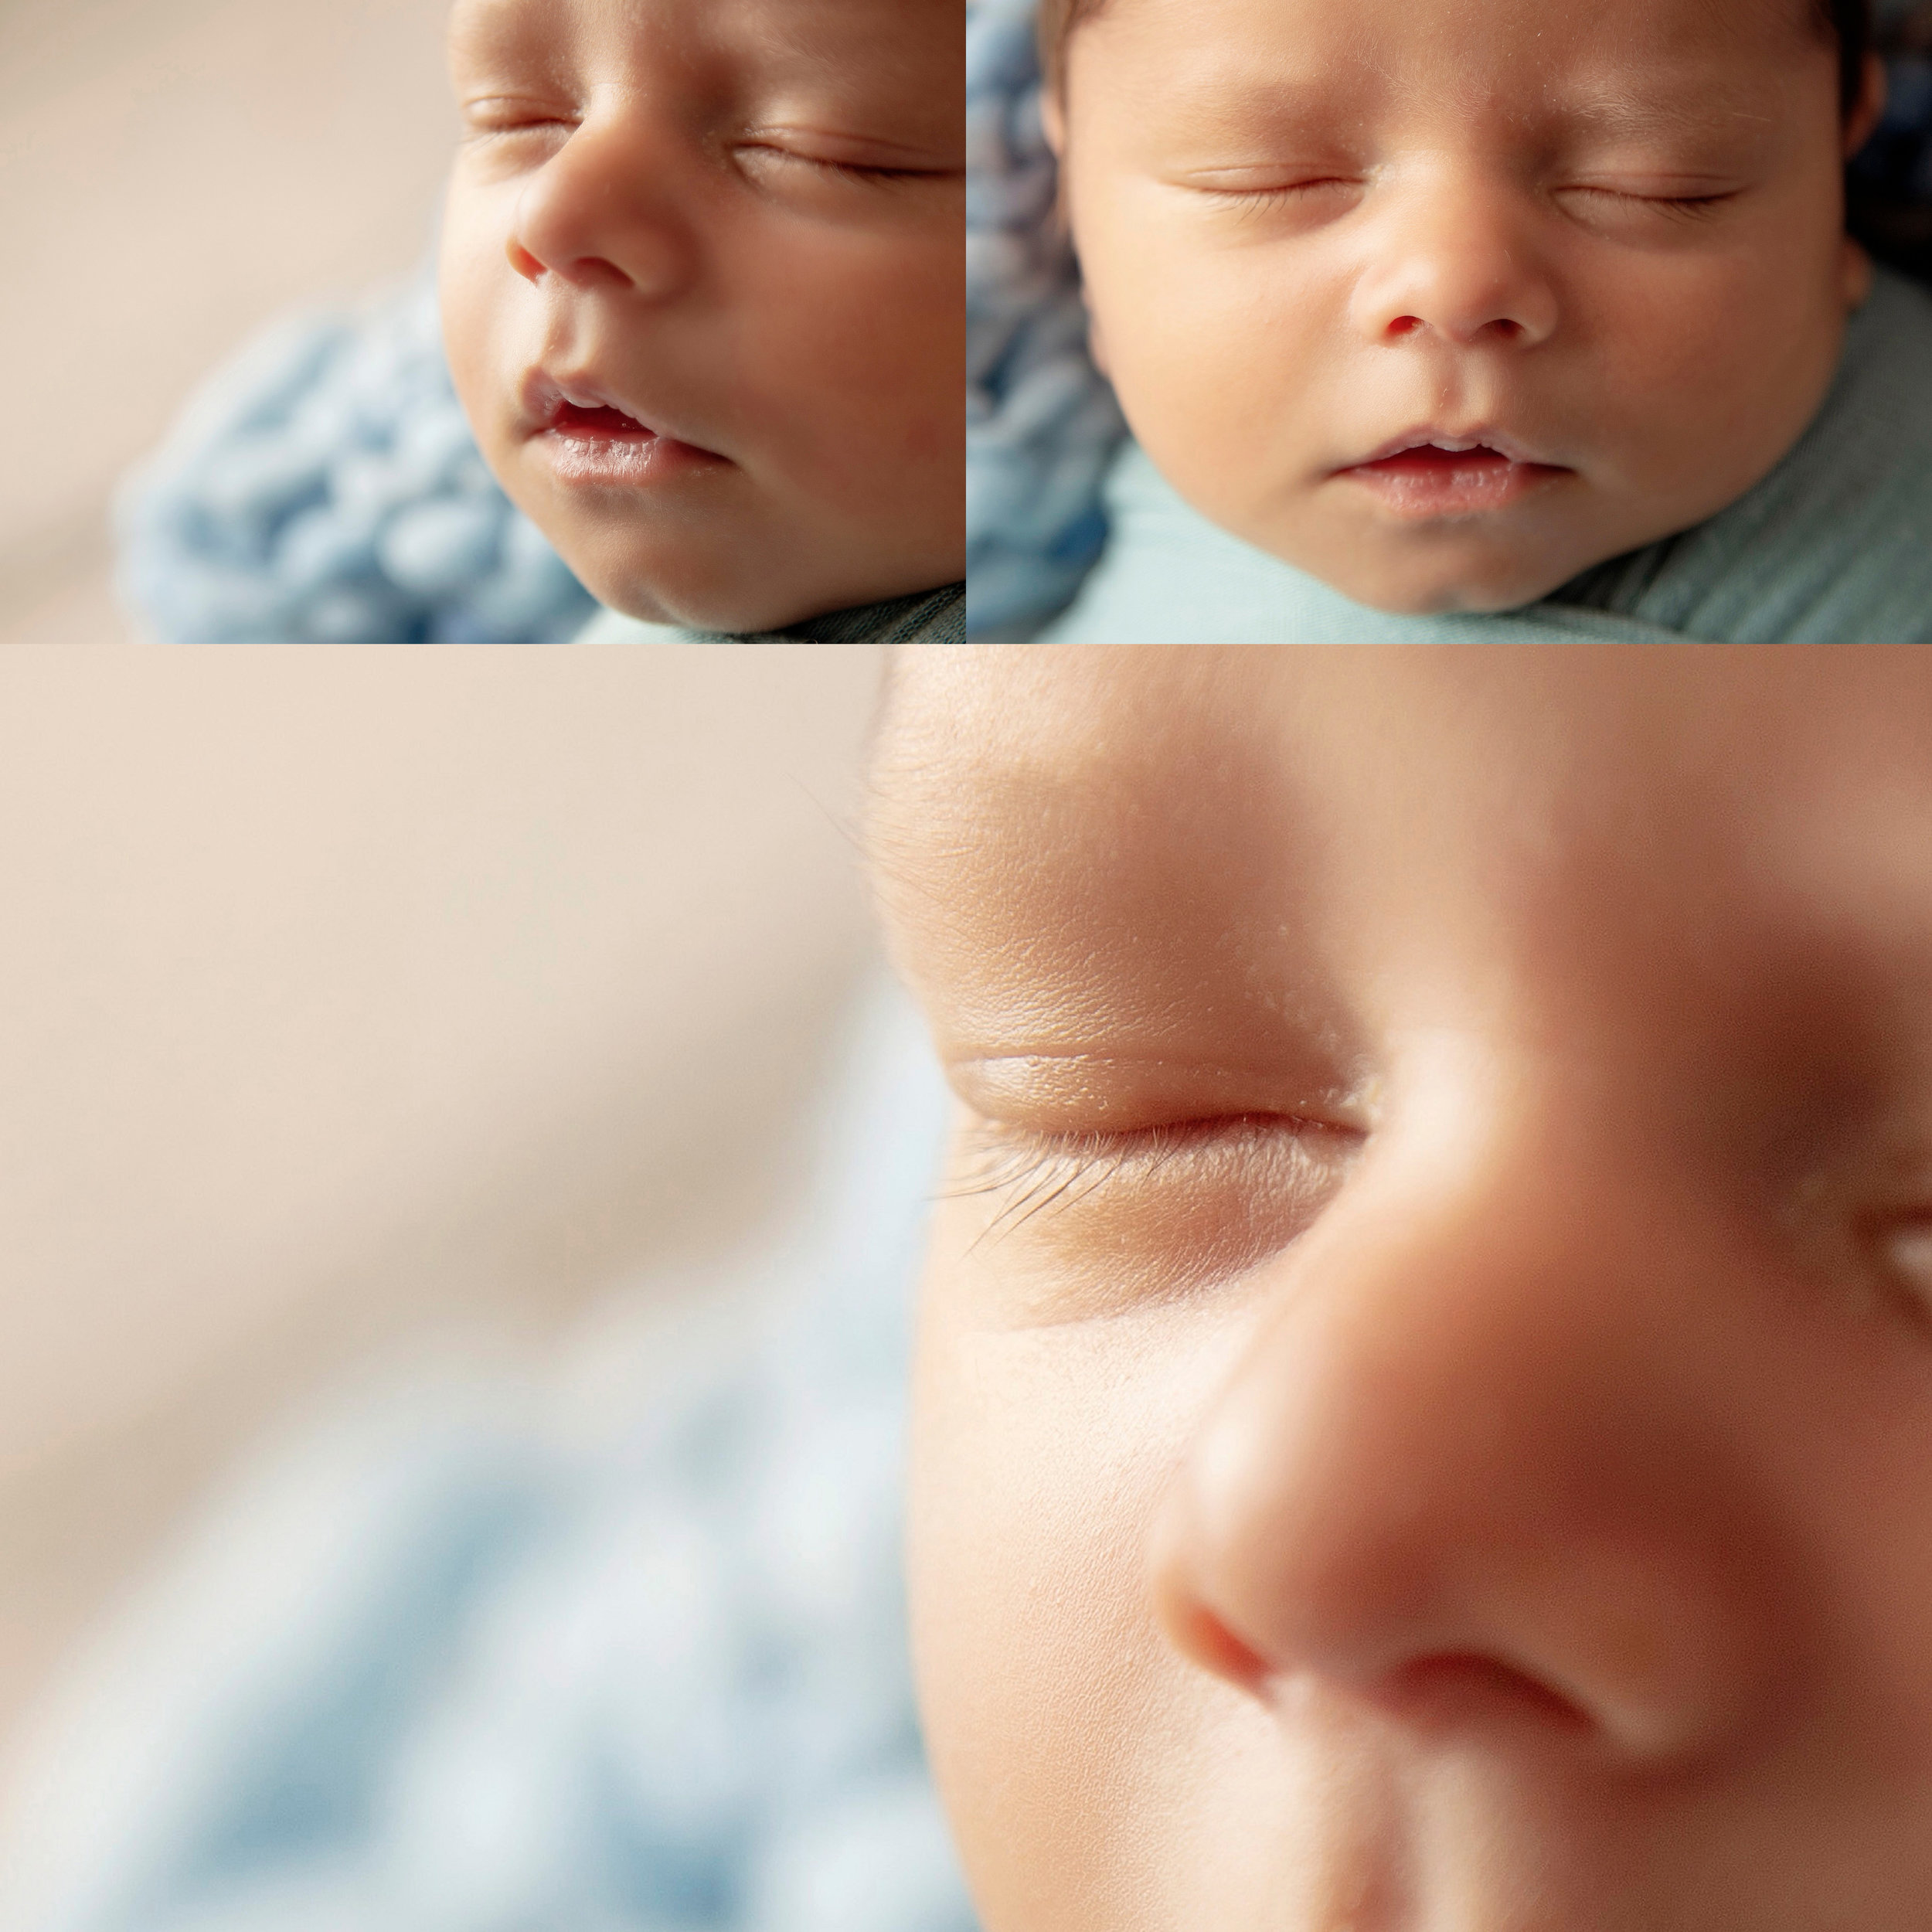 Lancaster_Newborn_Session_Angie_Englerth_Theodore_004.jpg